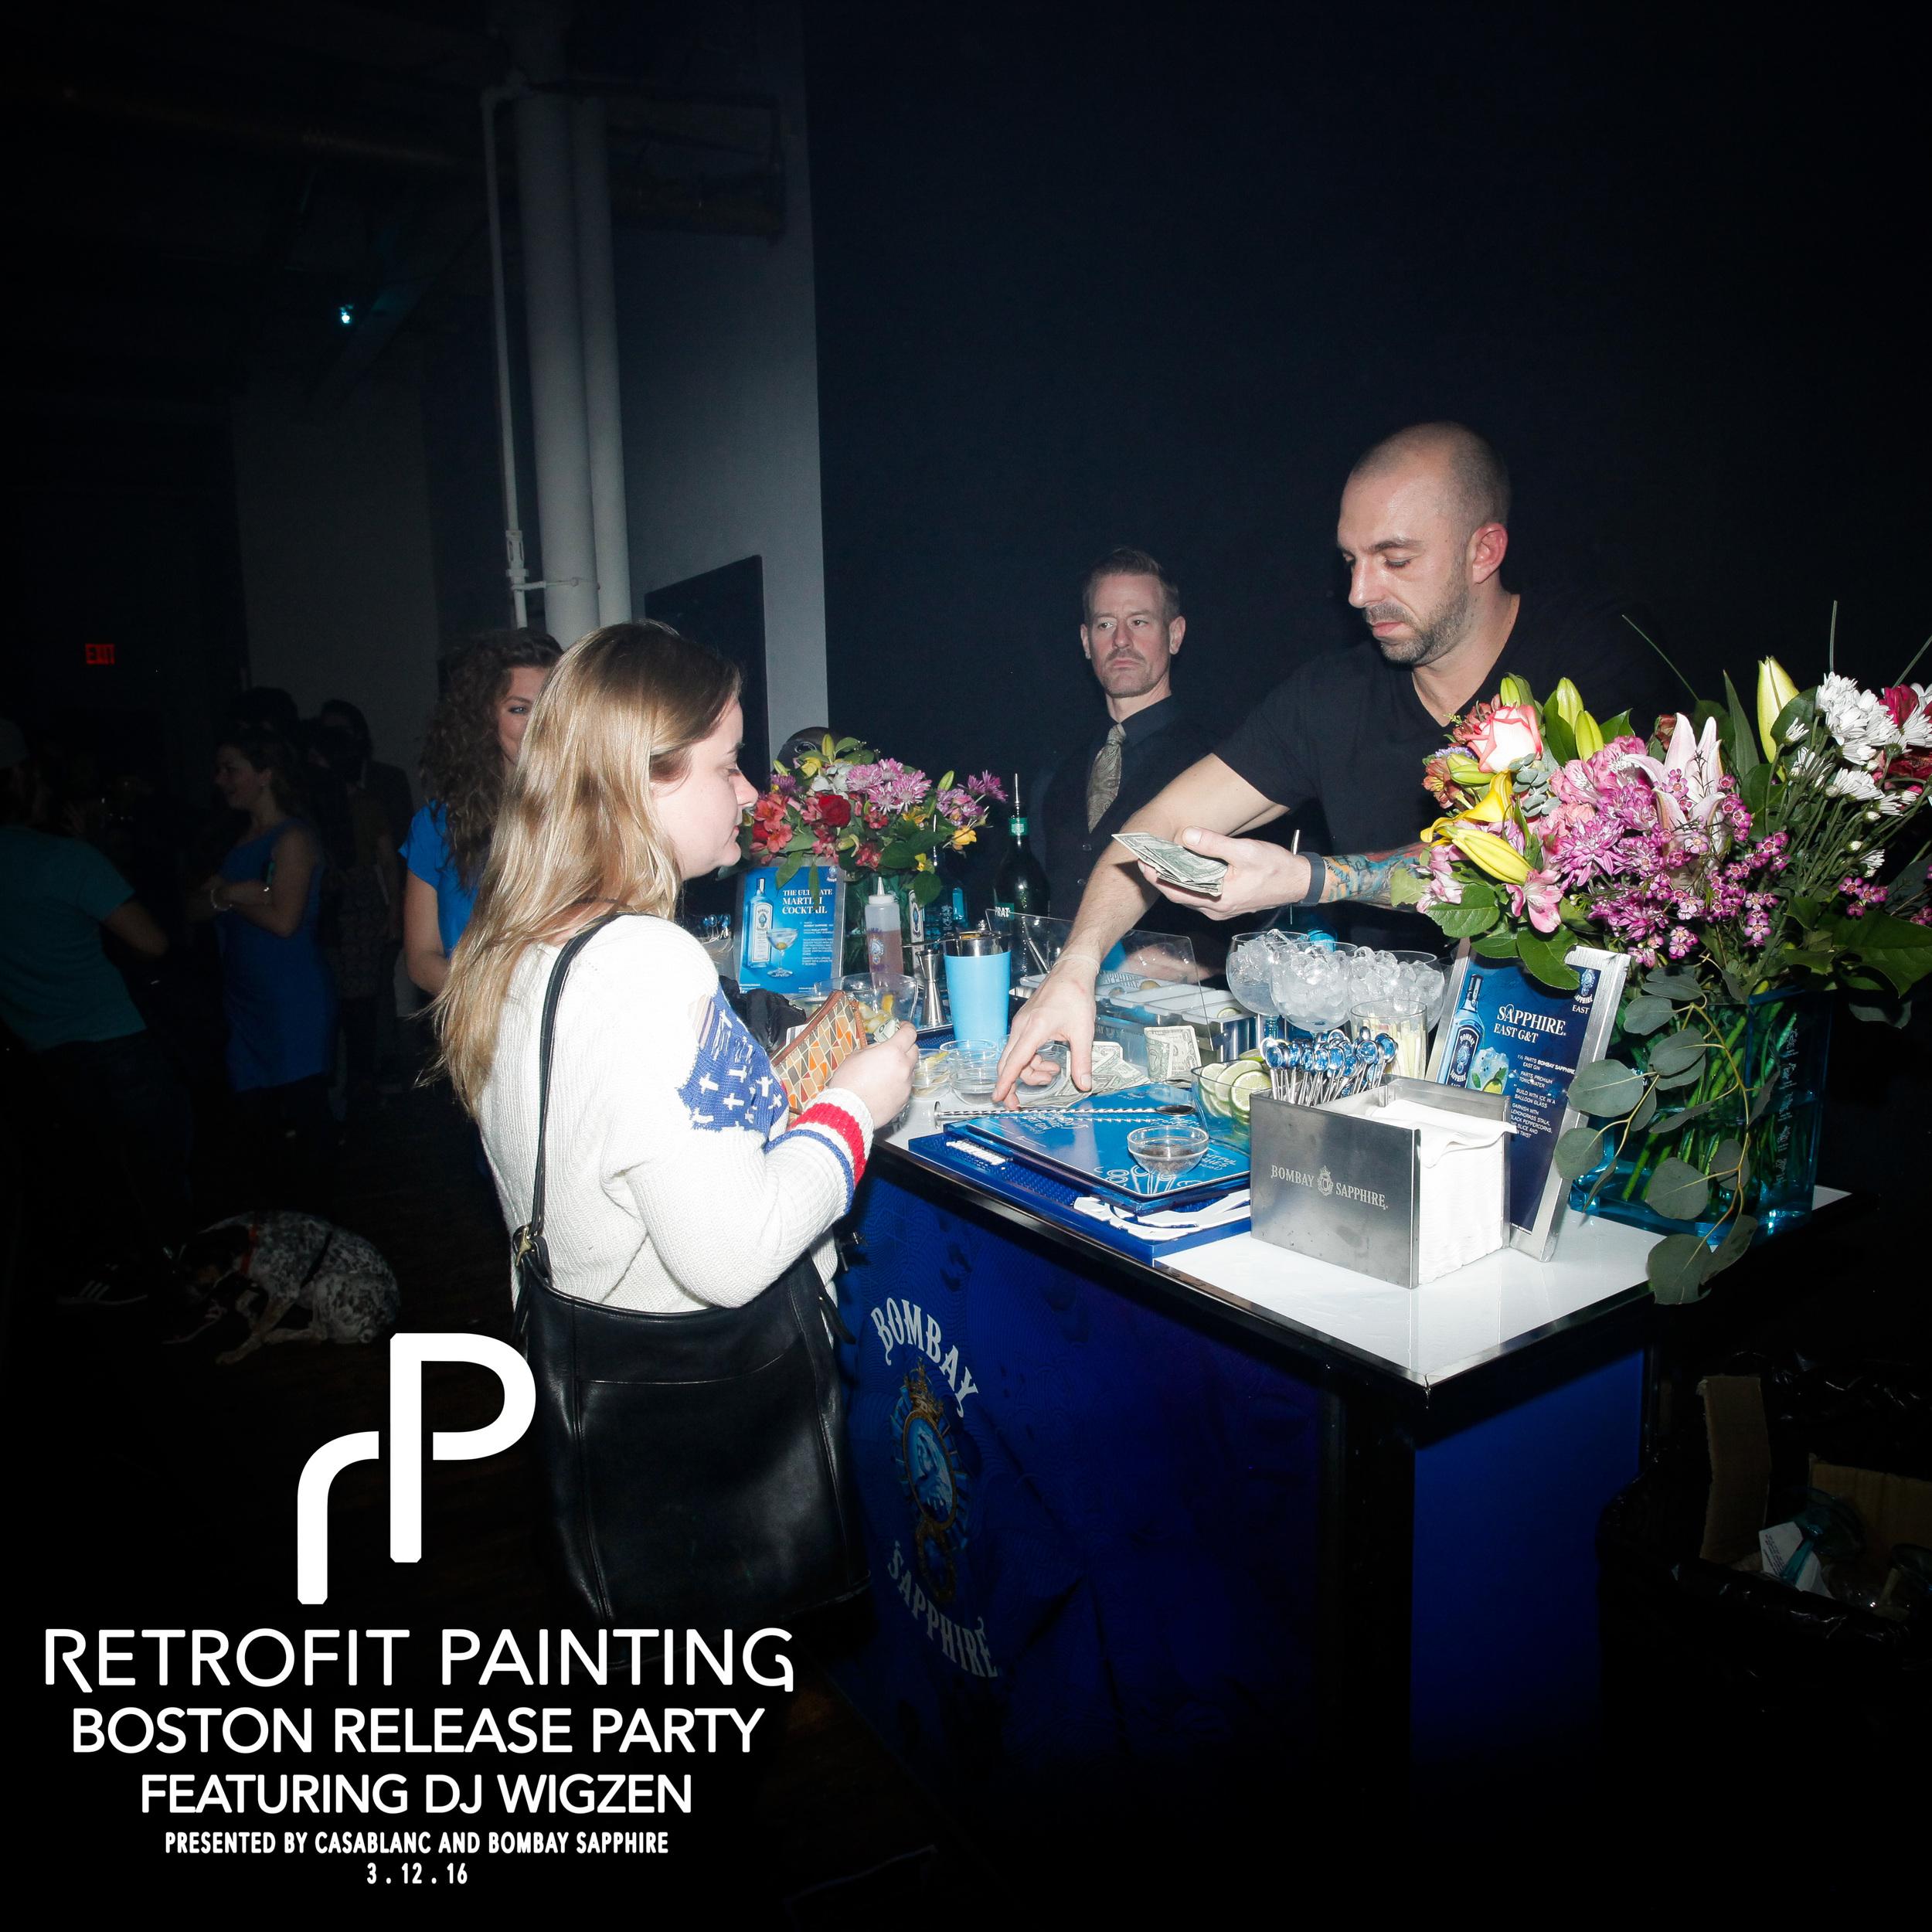 Retrofit Painting Boston Release Party 0034.jpg